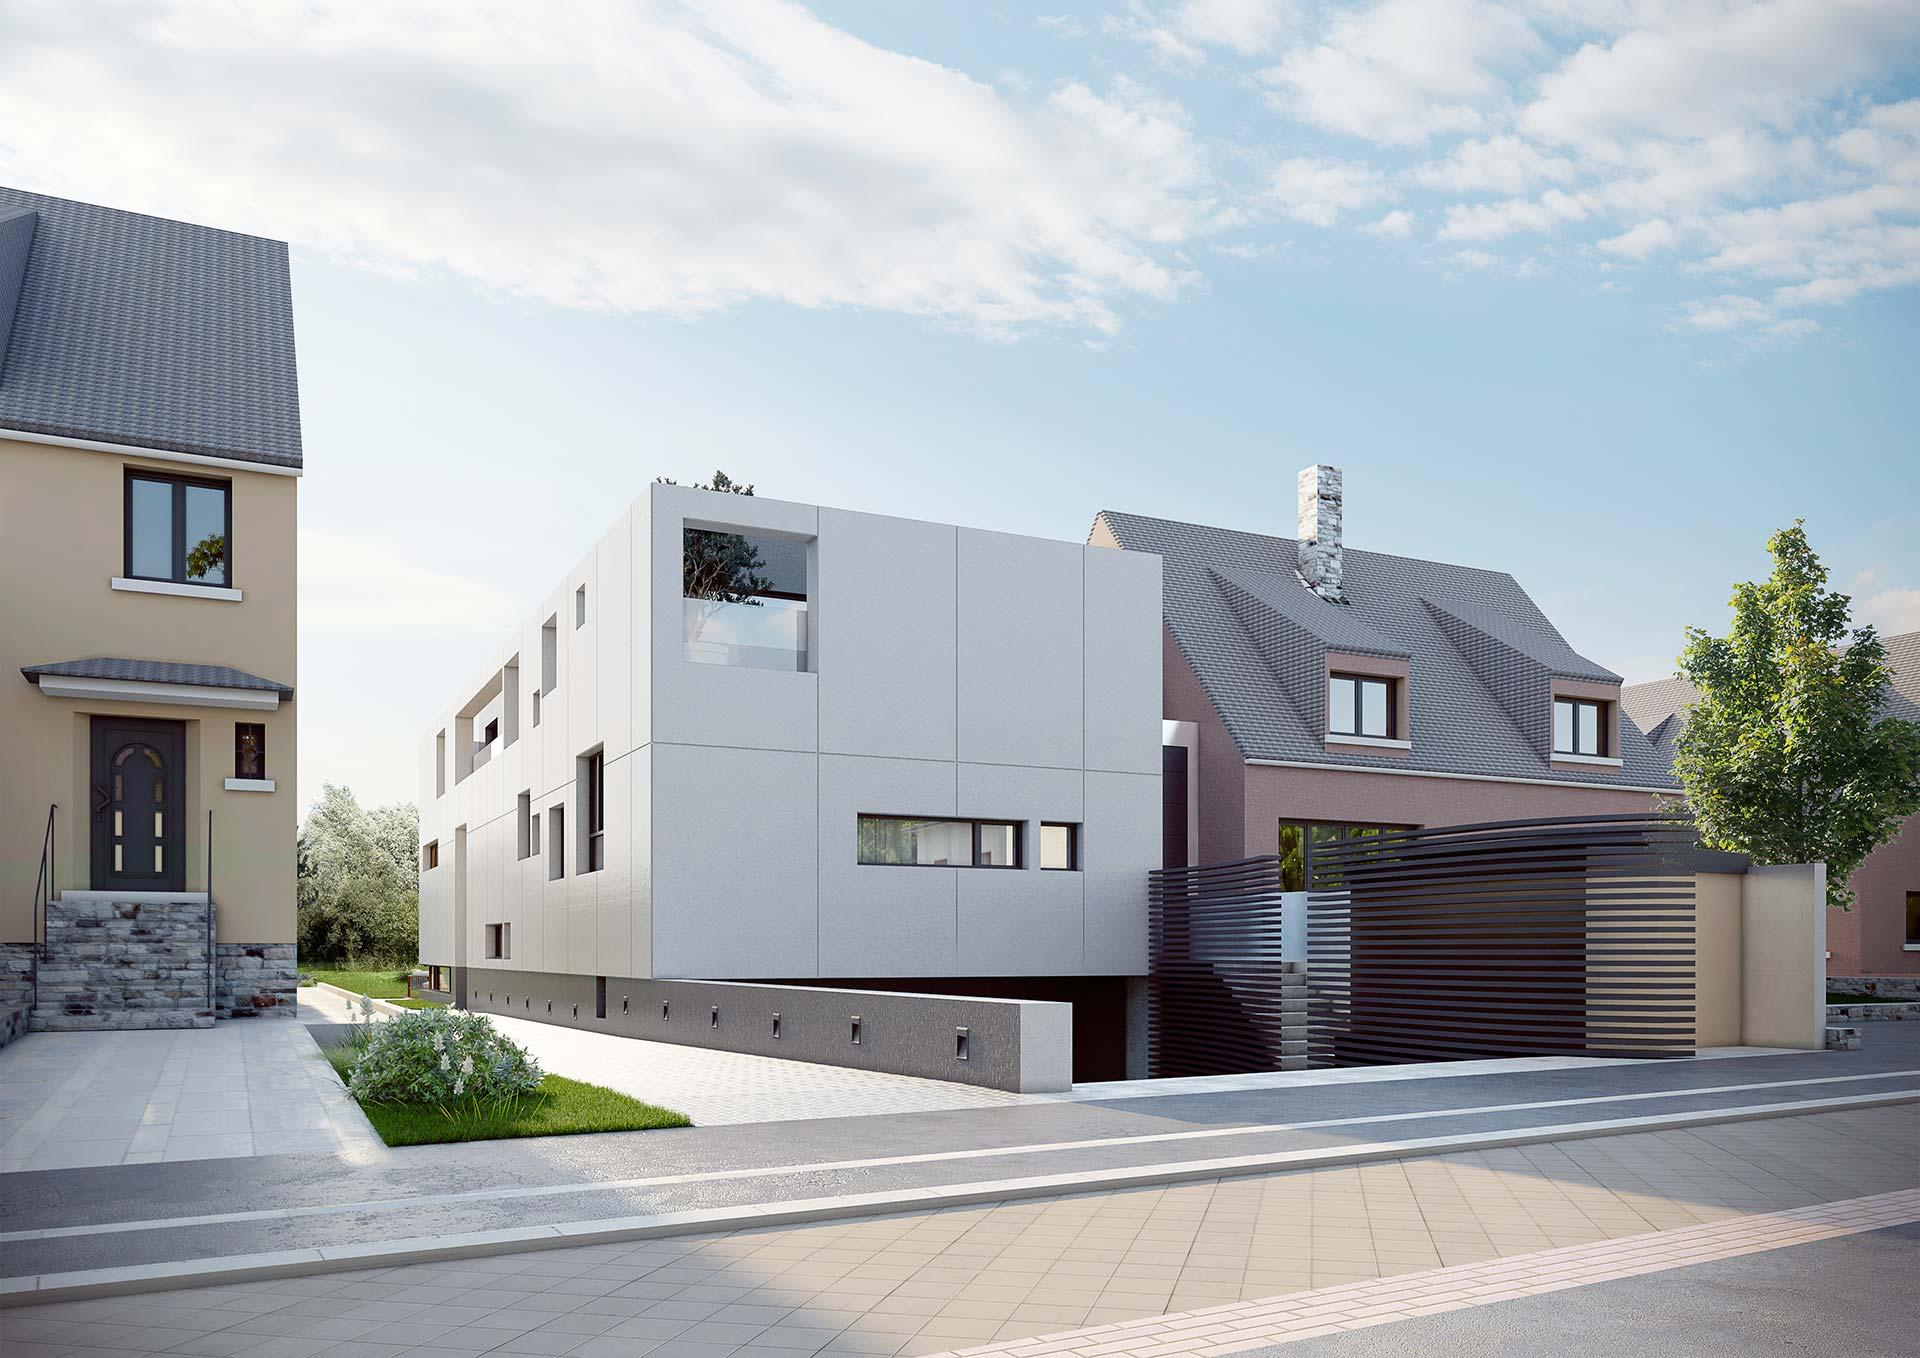 Villa Saphir Luxembourg - visuel 3D